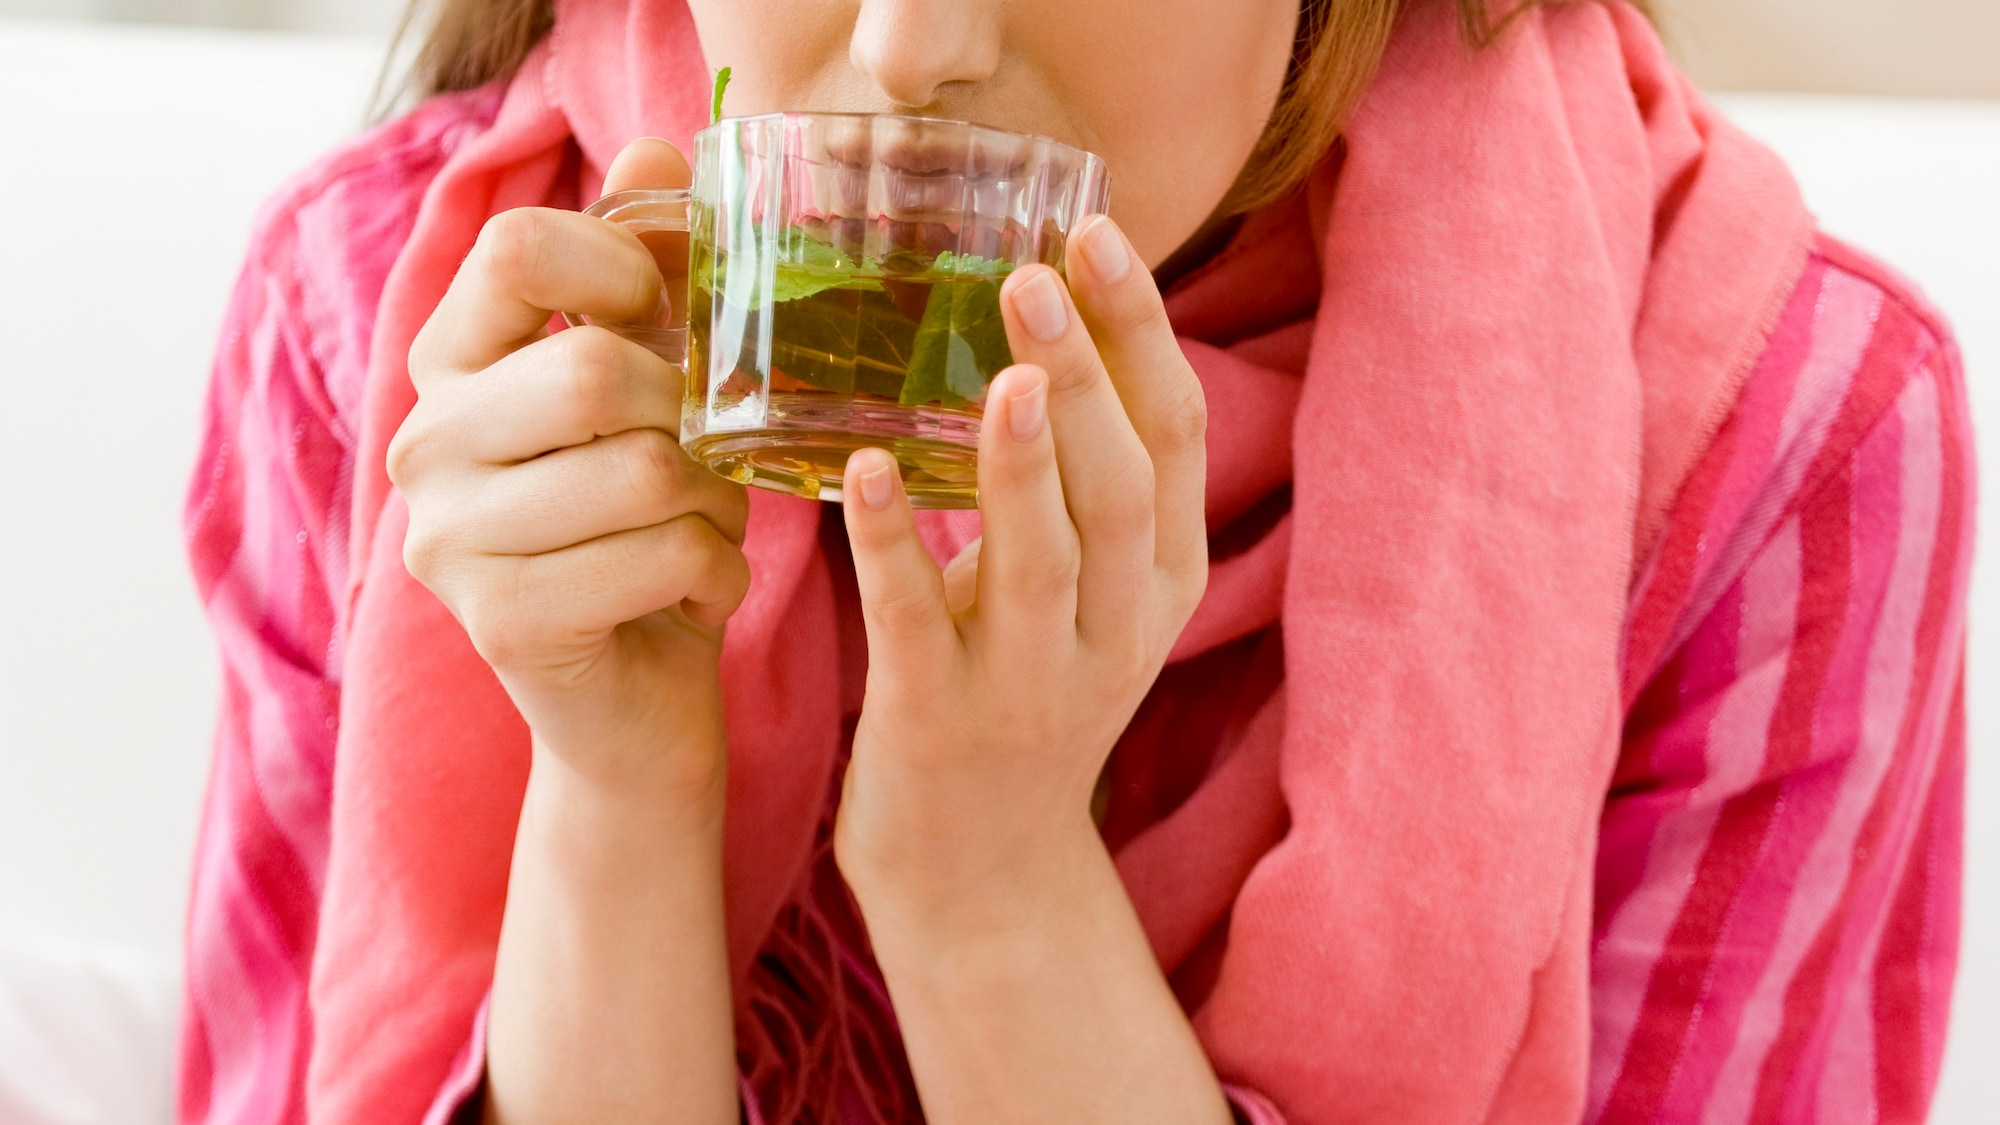 Neue Studie zeigt: Darum ist heisser Tee krebserregend